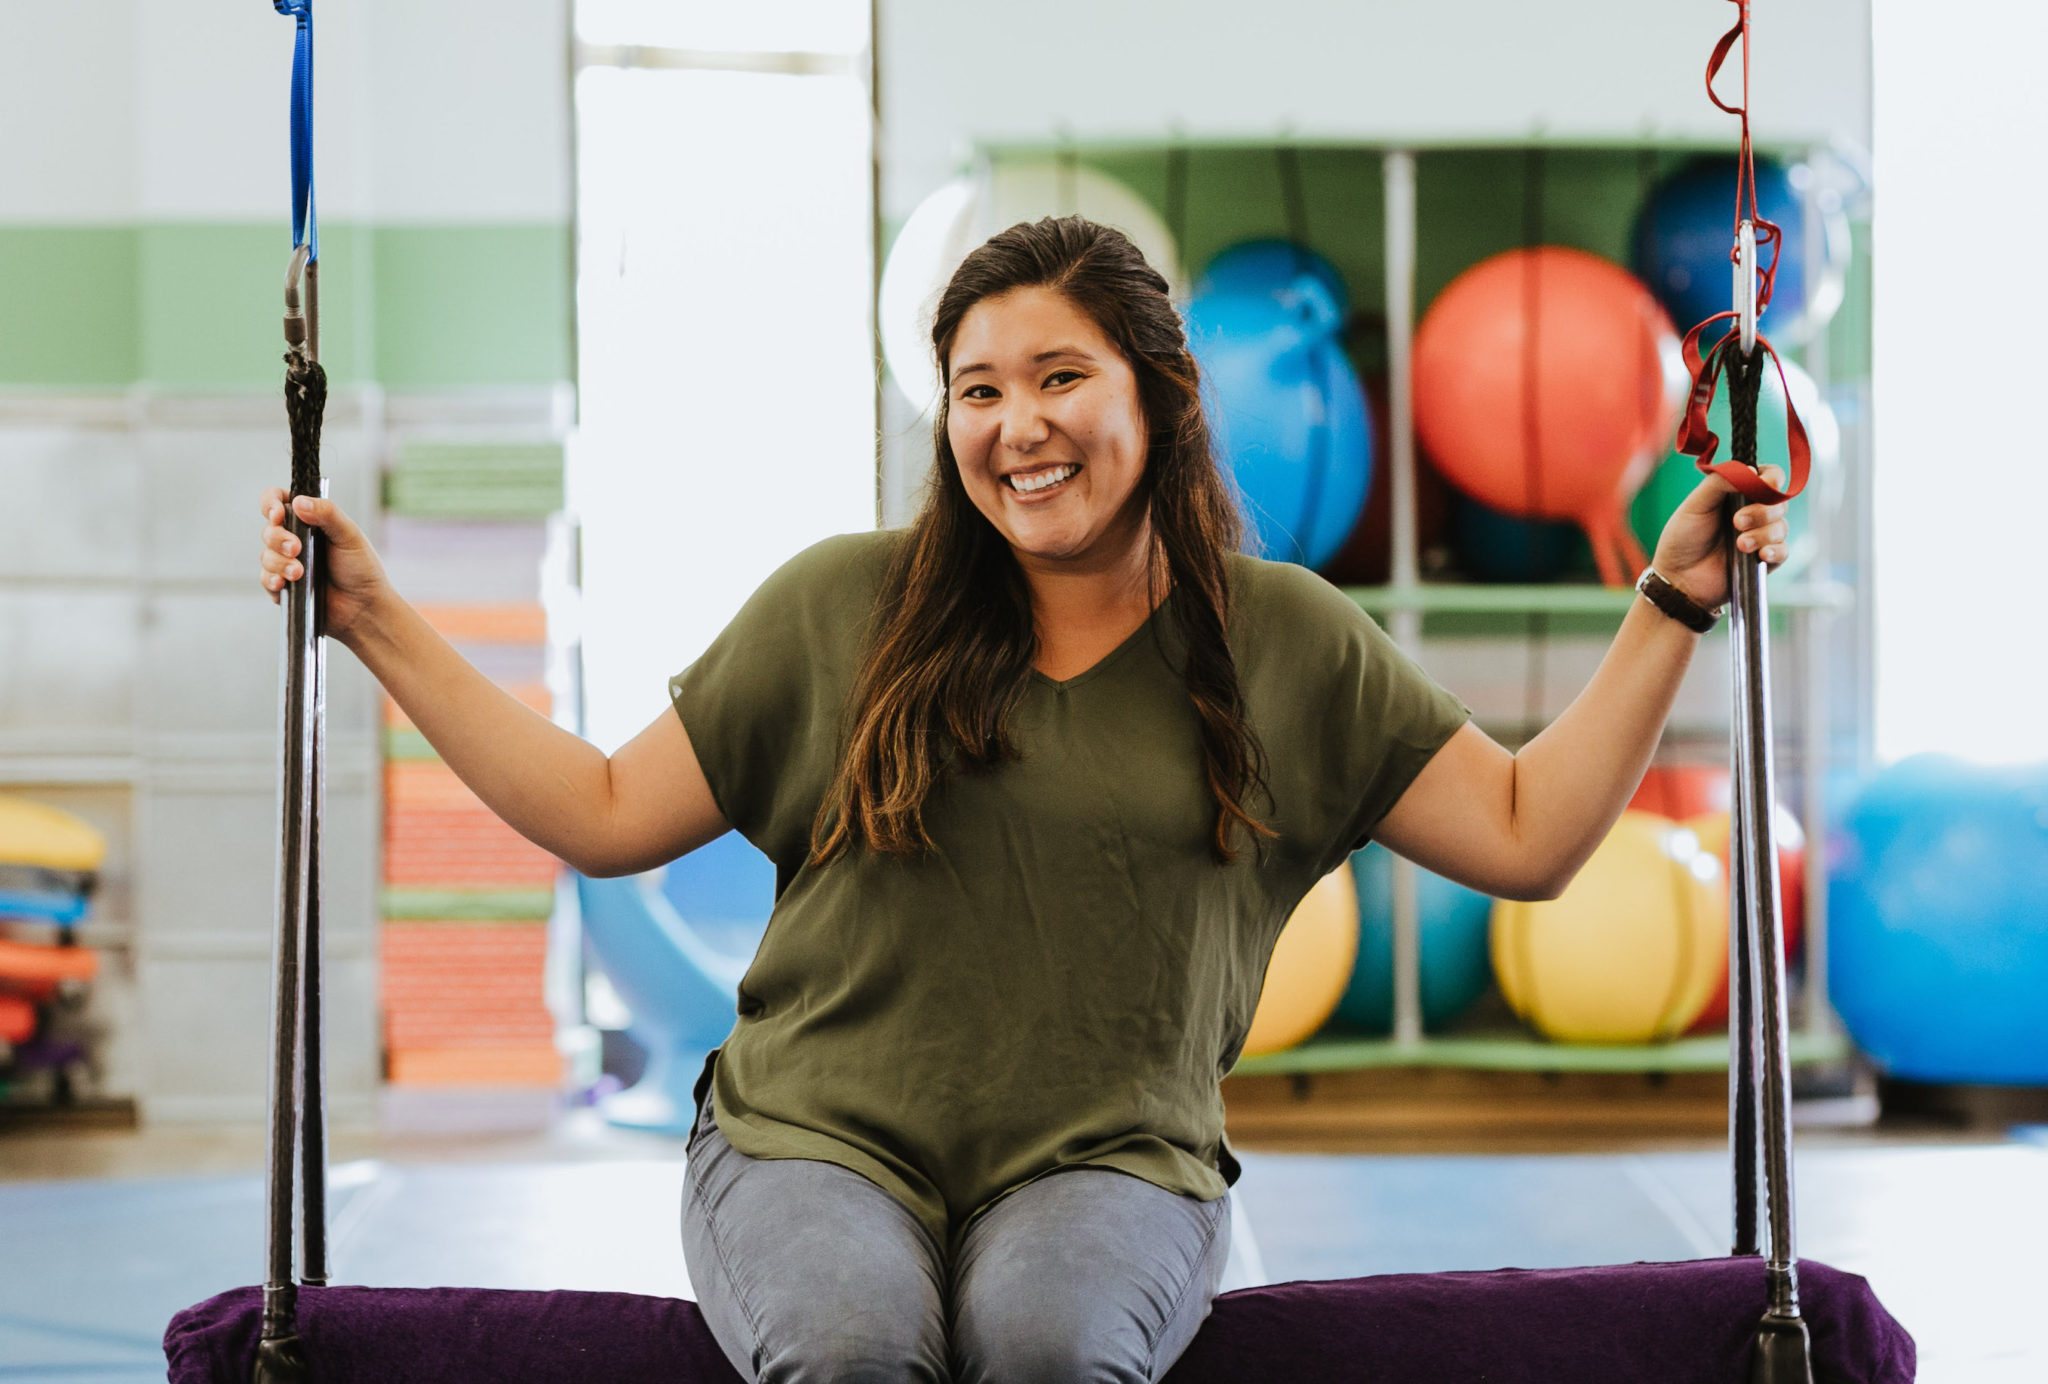 Speech Language Pathologist Amy sitting on a swing in the sensory gym